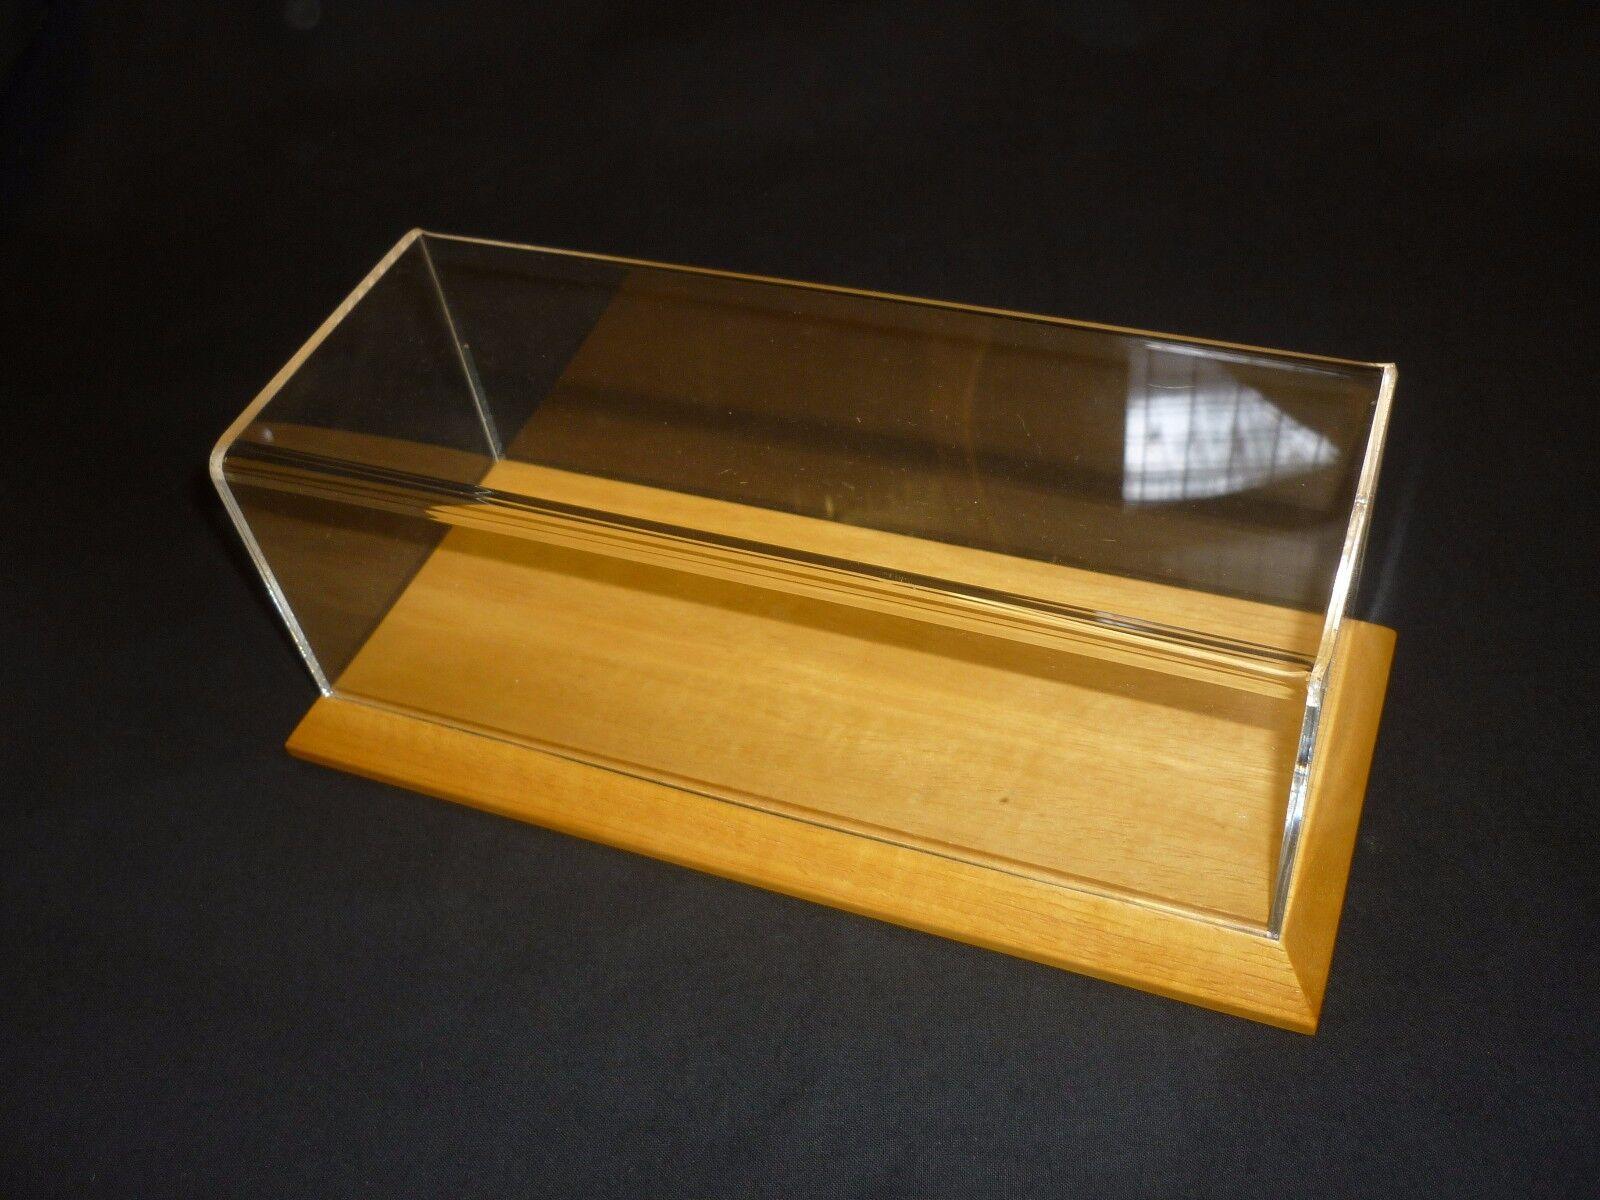 Danbury Comme neuf JAMES BOND BOND BOND ASTON MARTIN DB5, avec paperasse, Boxed, (NMB) 4ba44f